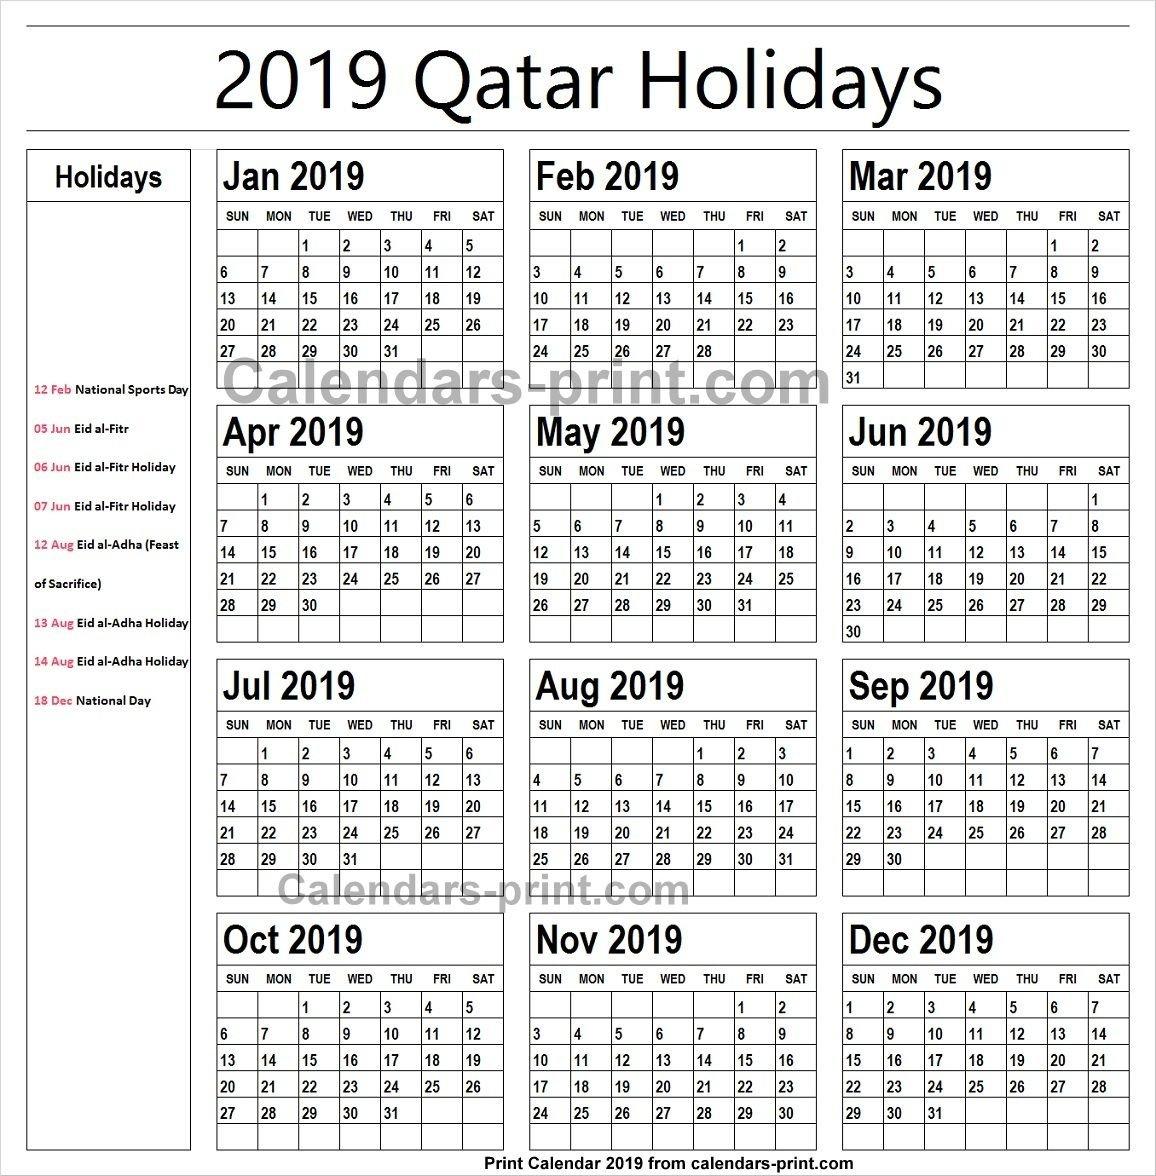 2019 Calendar With Holidays Qatar Printable | Holidays Calendar 2019 Calendar 2019 Qatar